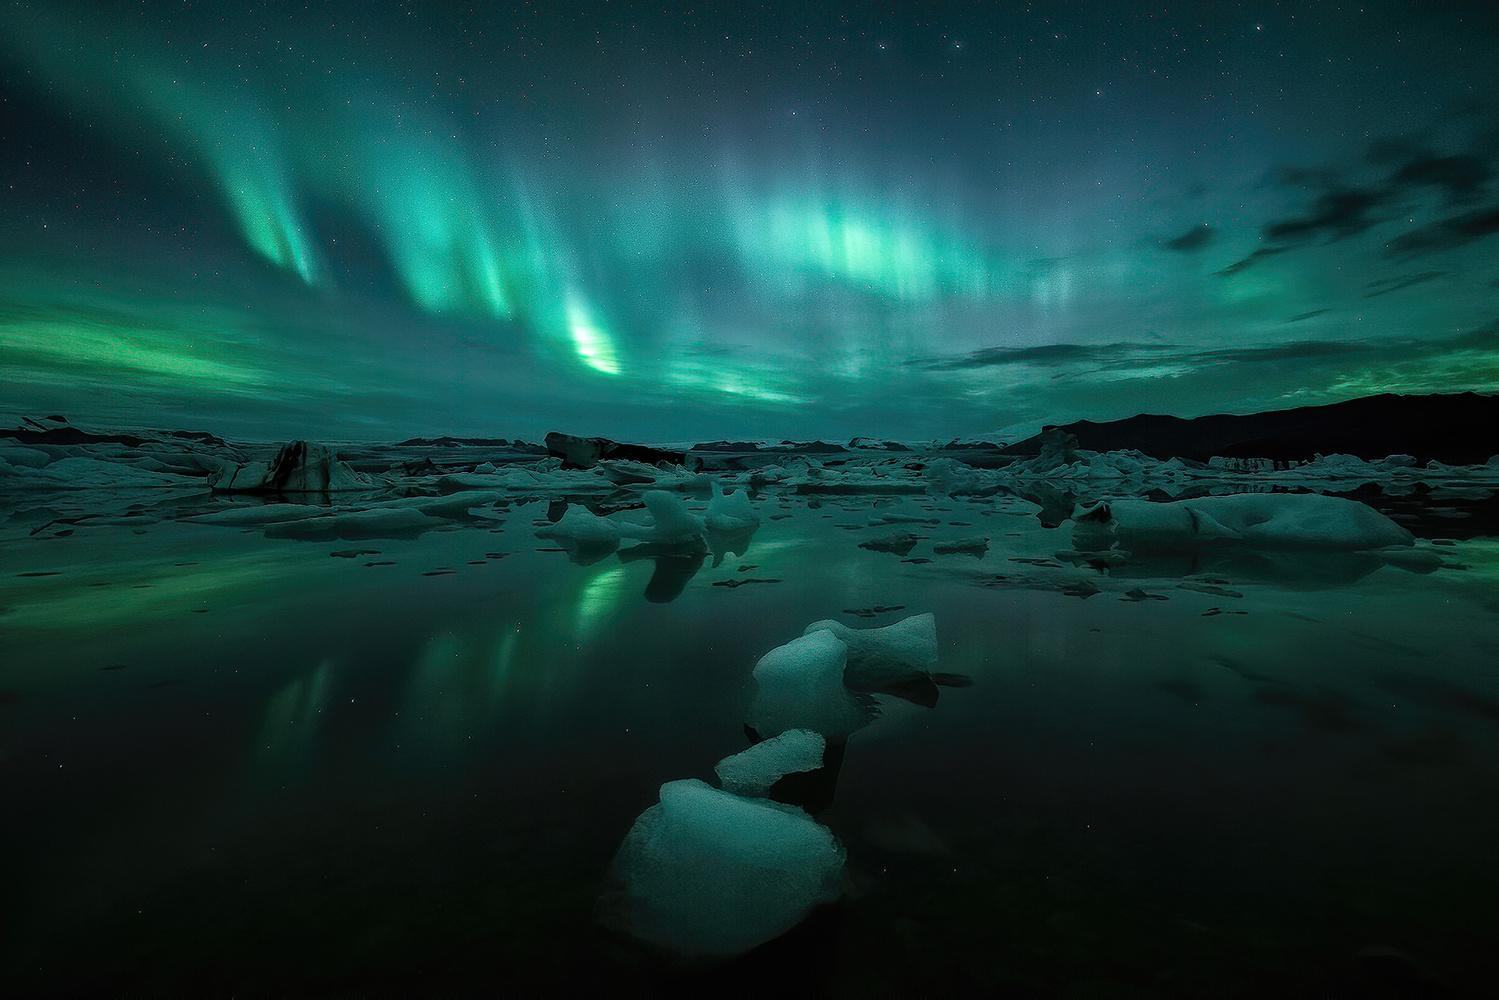 Magic at the lagoon by Tor-Ivar Næss